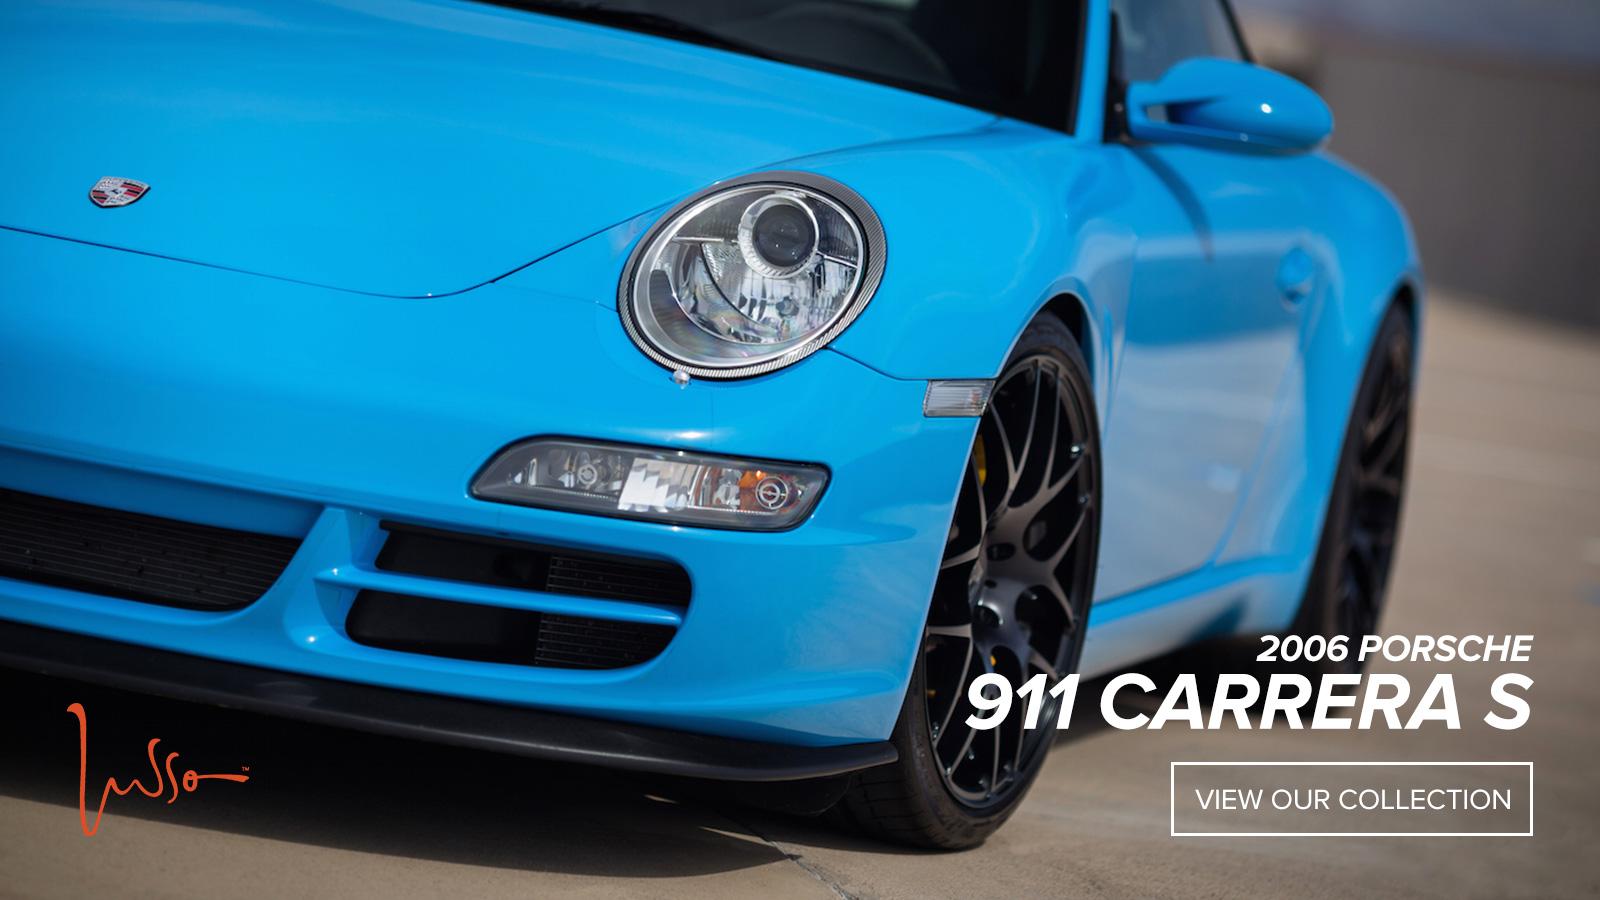 Lusso - 206 Porsche 911